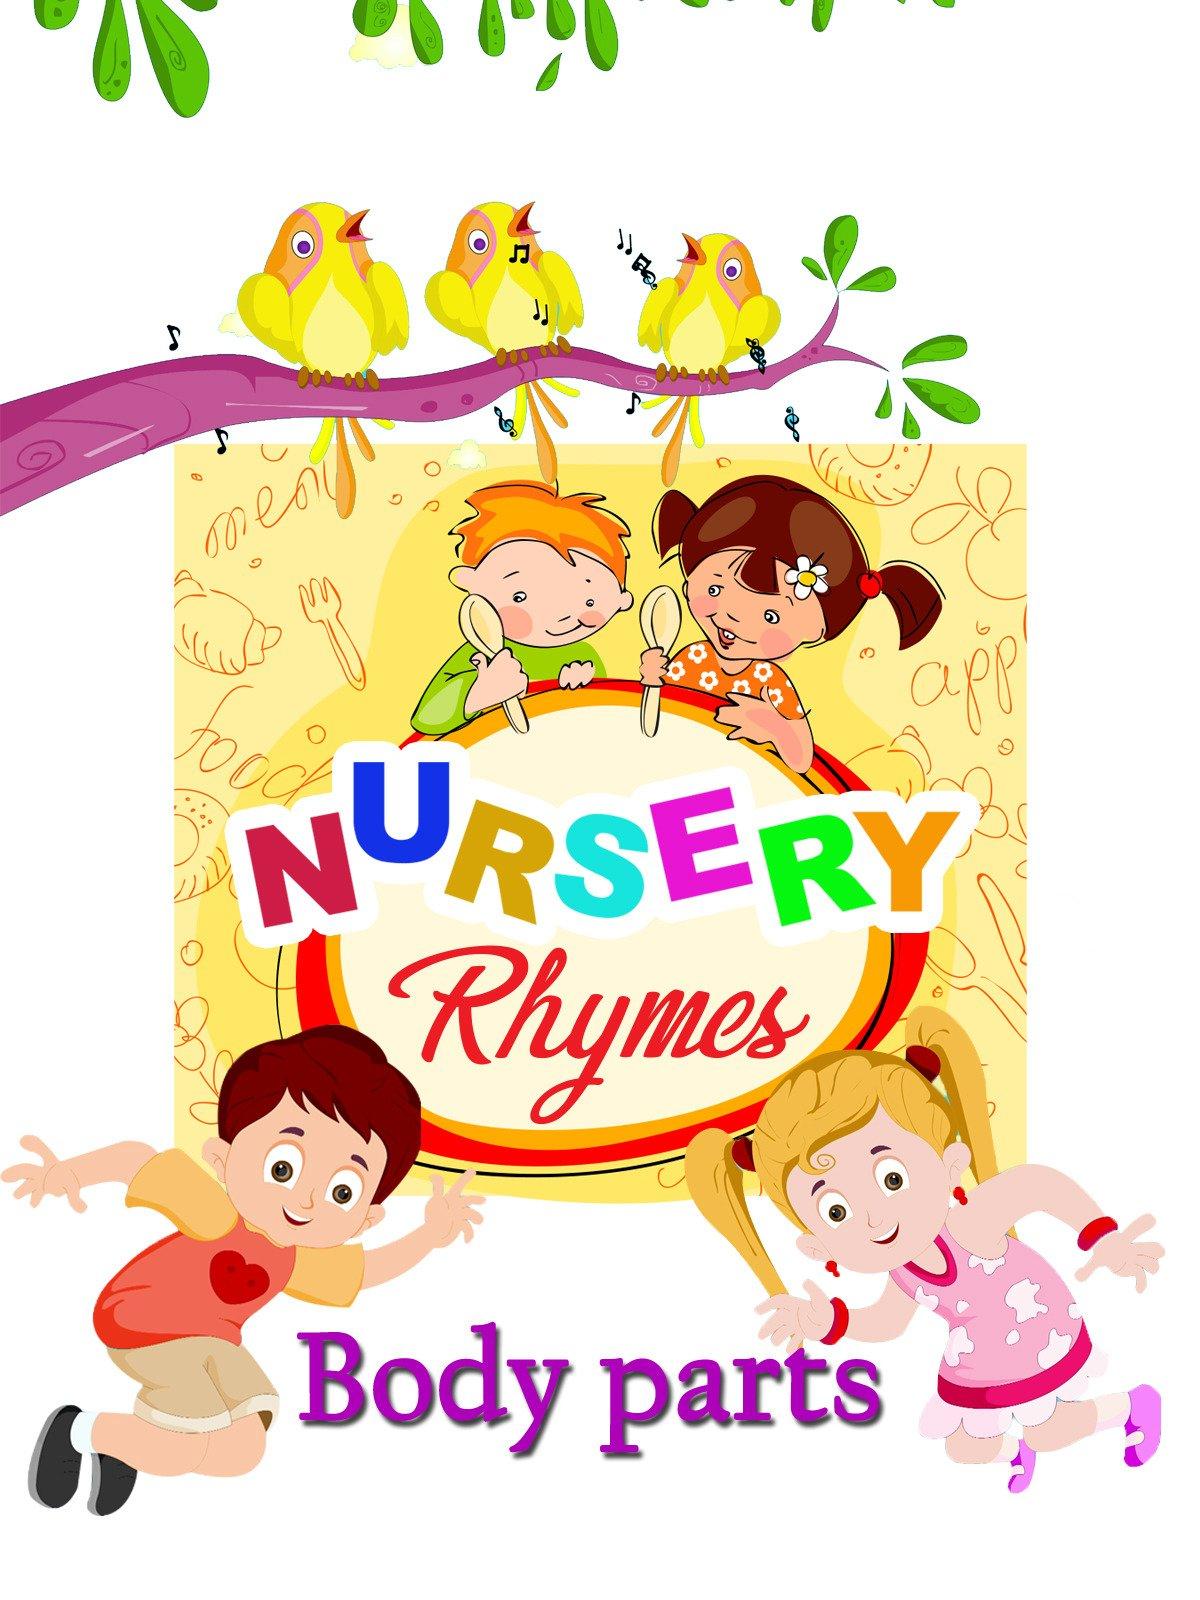 Amazon.com: Nursery Rhymes - Body Parts: Anon Trendz: Amazon Digital ...